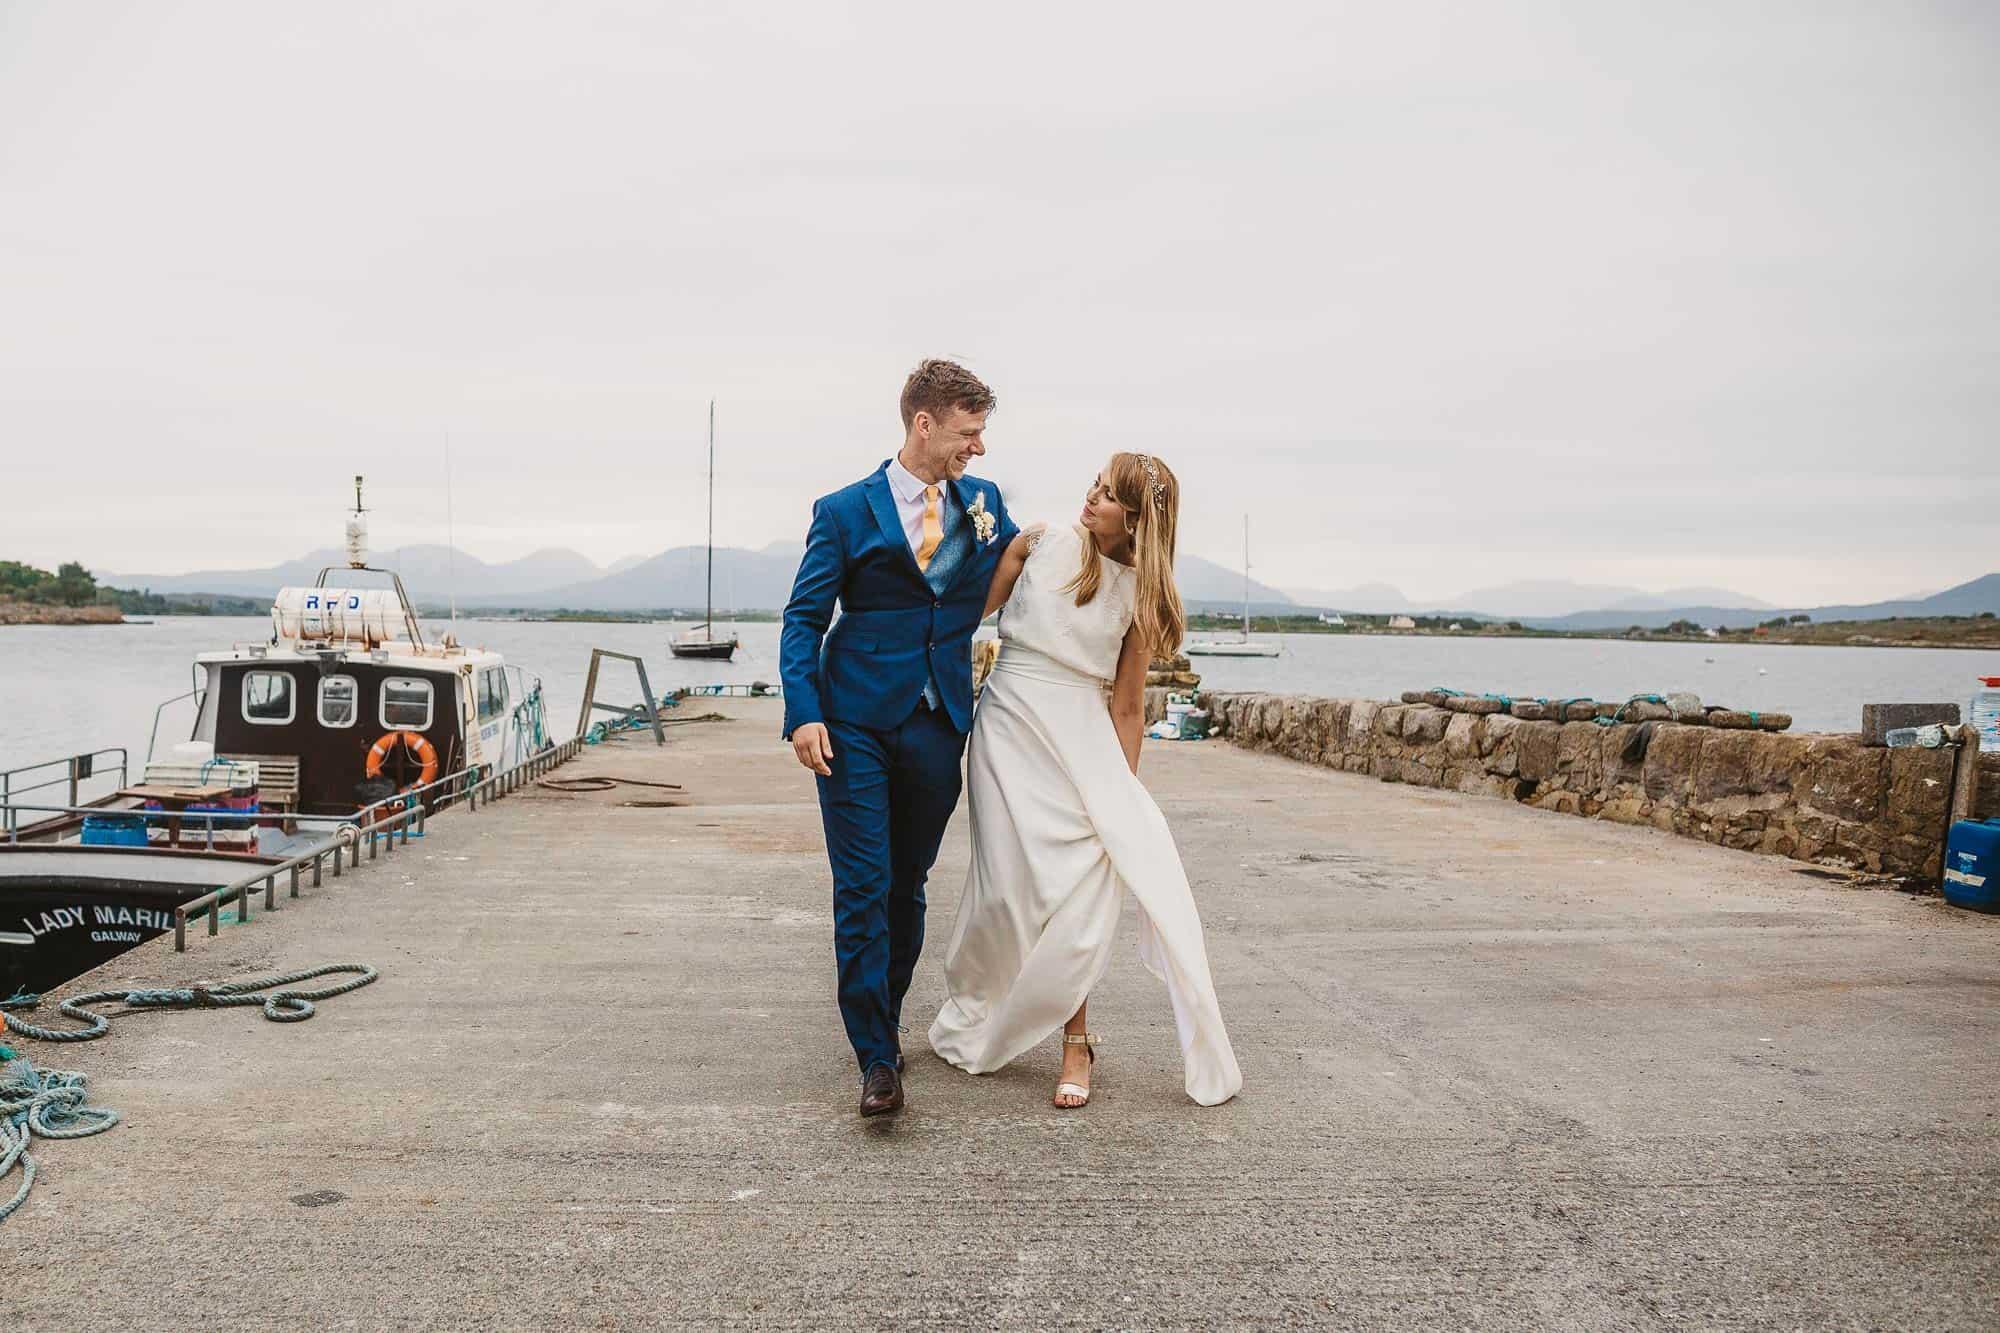 Elopement Ireland Connemara Love on the Pier i